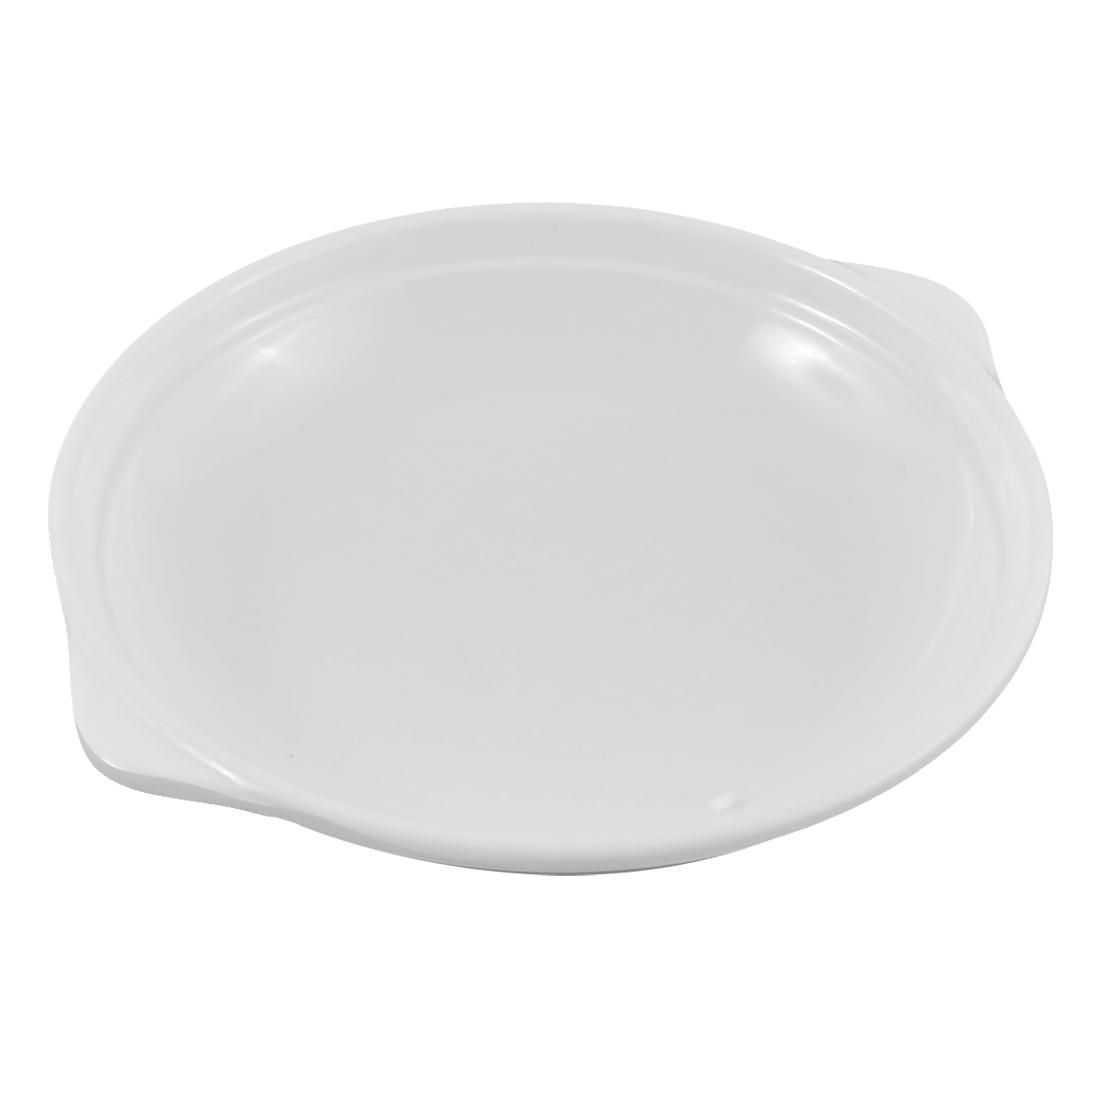 Restaurant Home Kitchen Plastic Double Ear Handles Design Dish Plate 5 Inch Dia